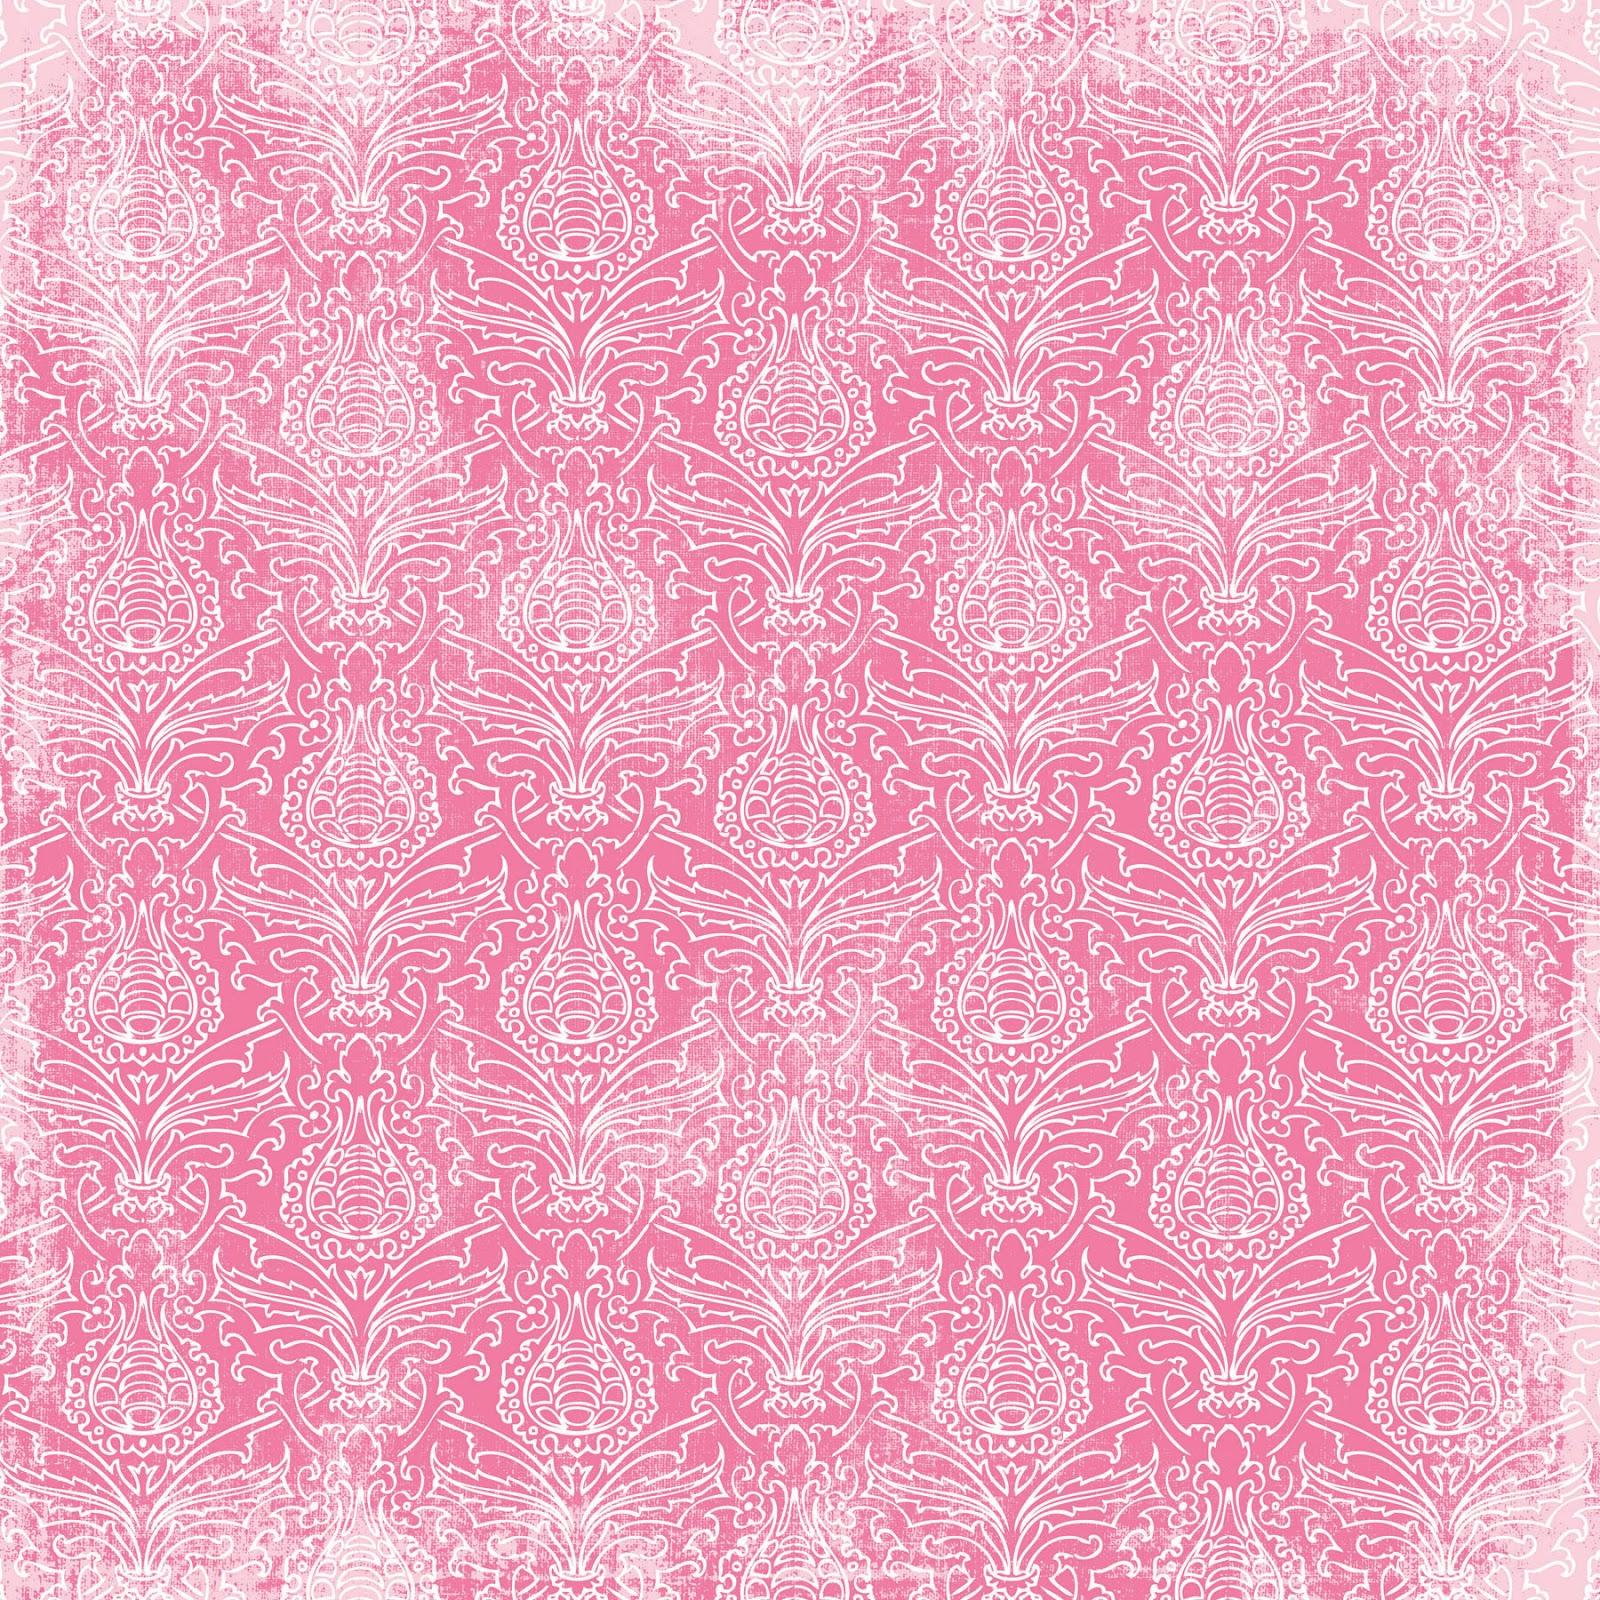 Pink Scrapbooking Digital Scrapbook Paper Pink